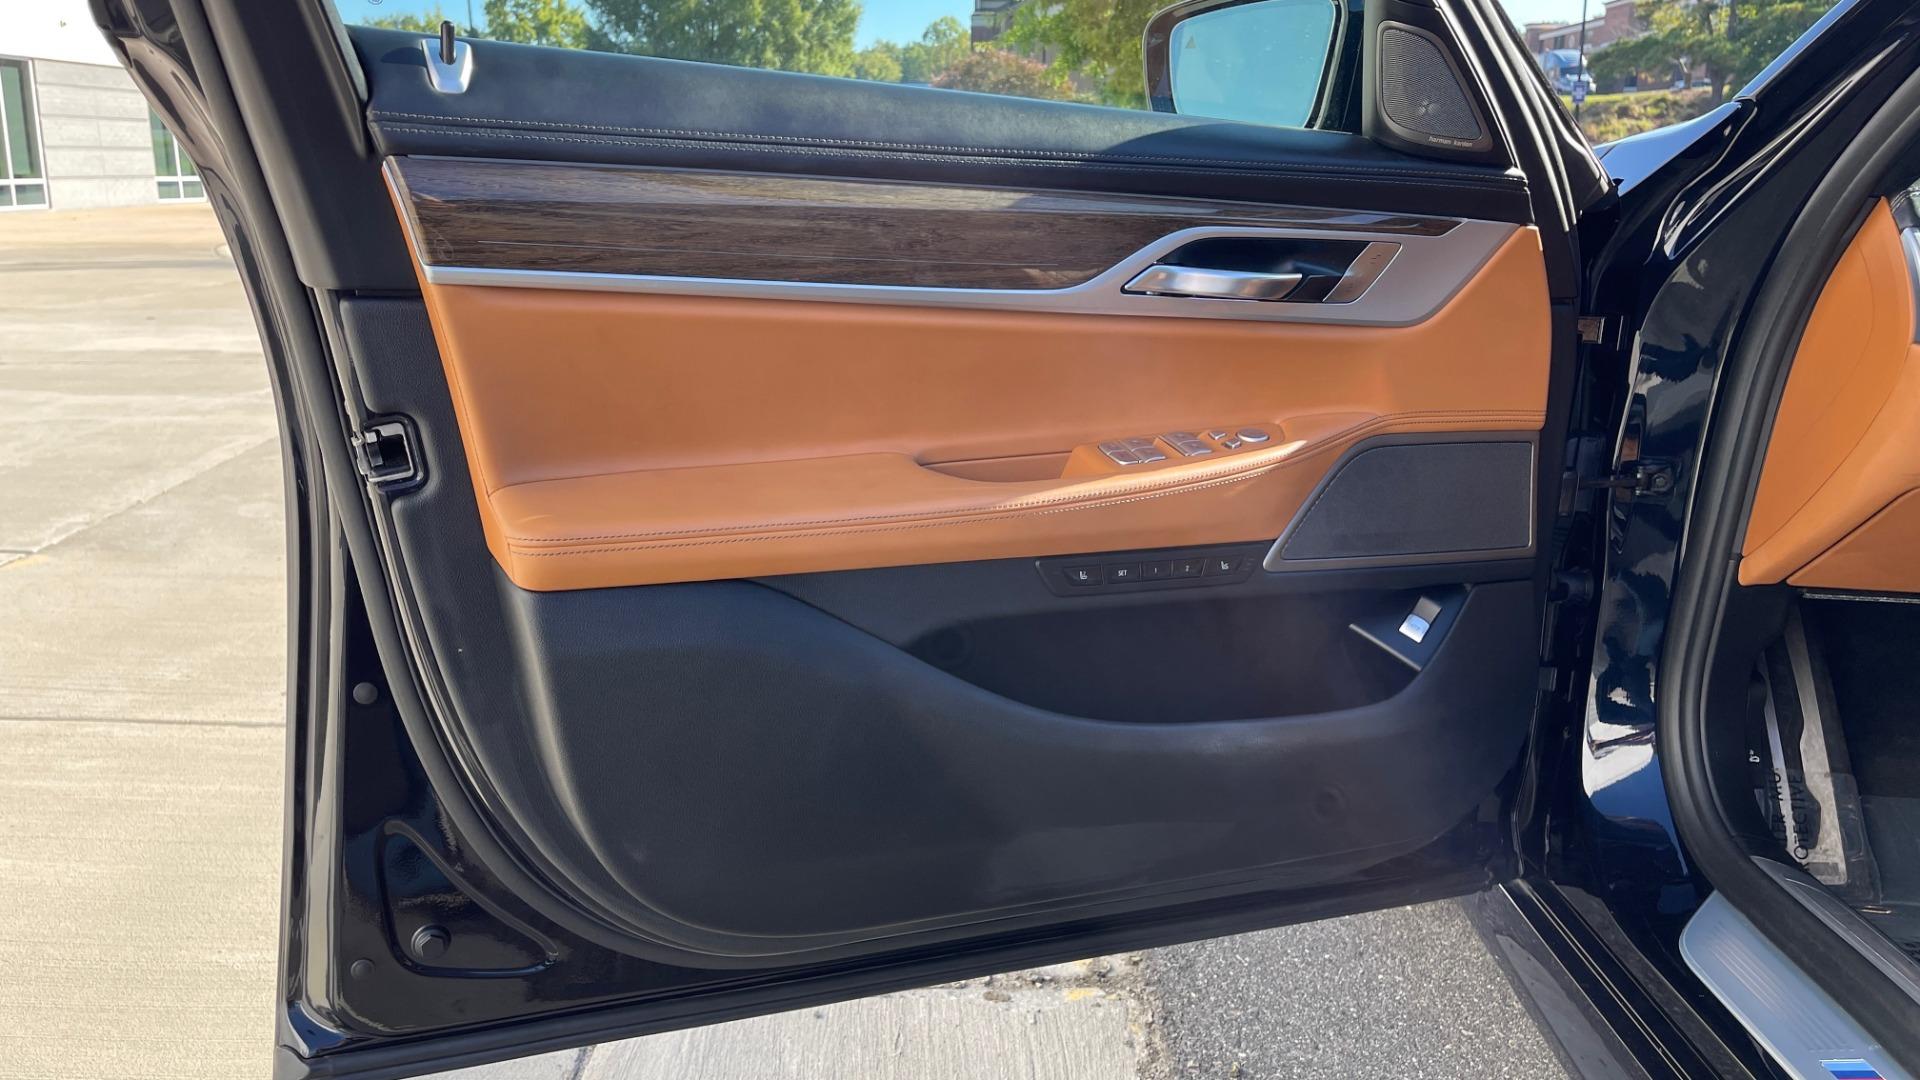 Used 2019 BMW 7 SERIES 750I XDRIVE M-SPORT / EXEC PKG / DRVR ASST PLUS / CLD WTHR / PAR for sale $60,995 at Formula Imports in Charlotte NC 28227 23